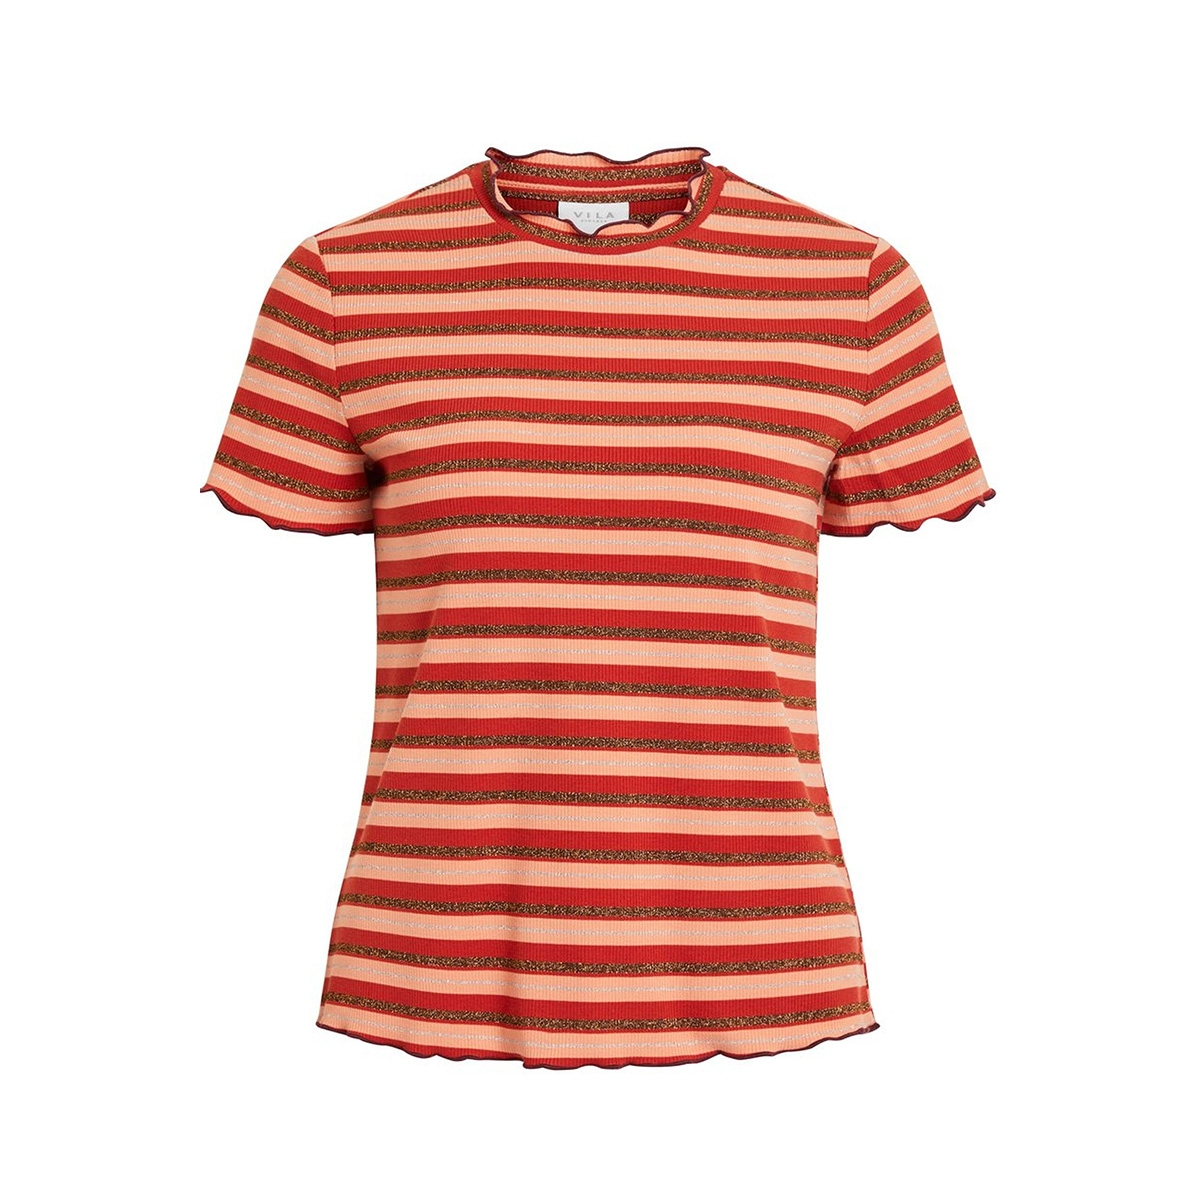 vidrala s/s t-shirt 14054002 vila t-shirt canyon sunset/w. copper